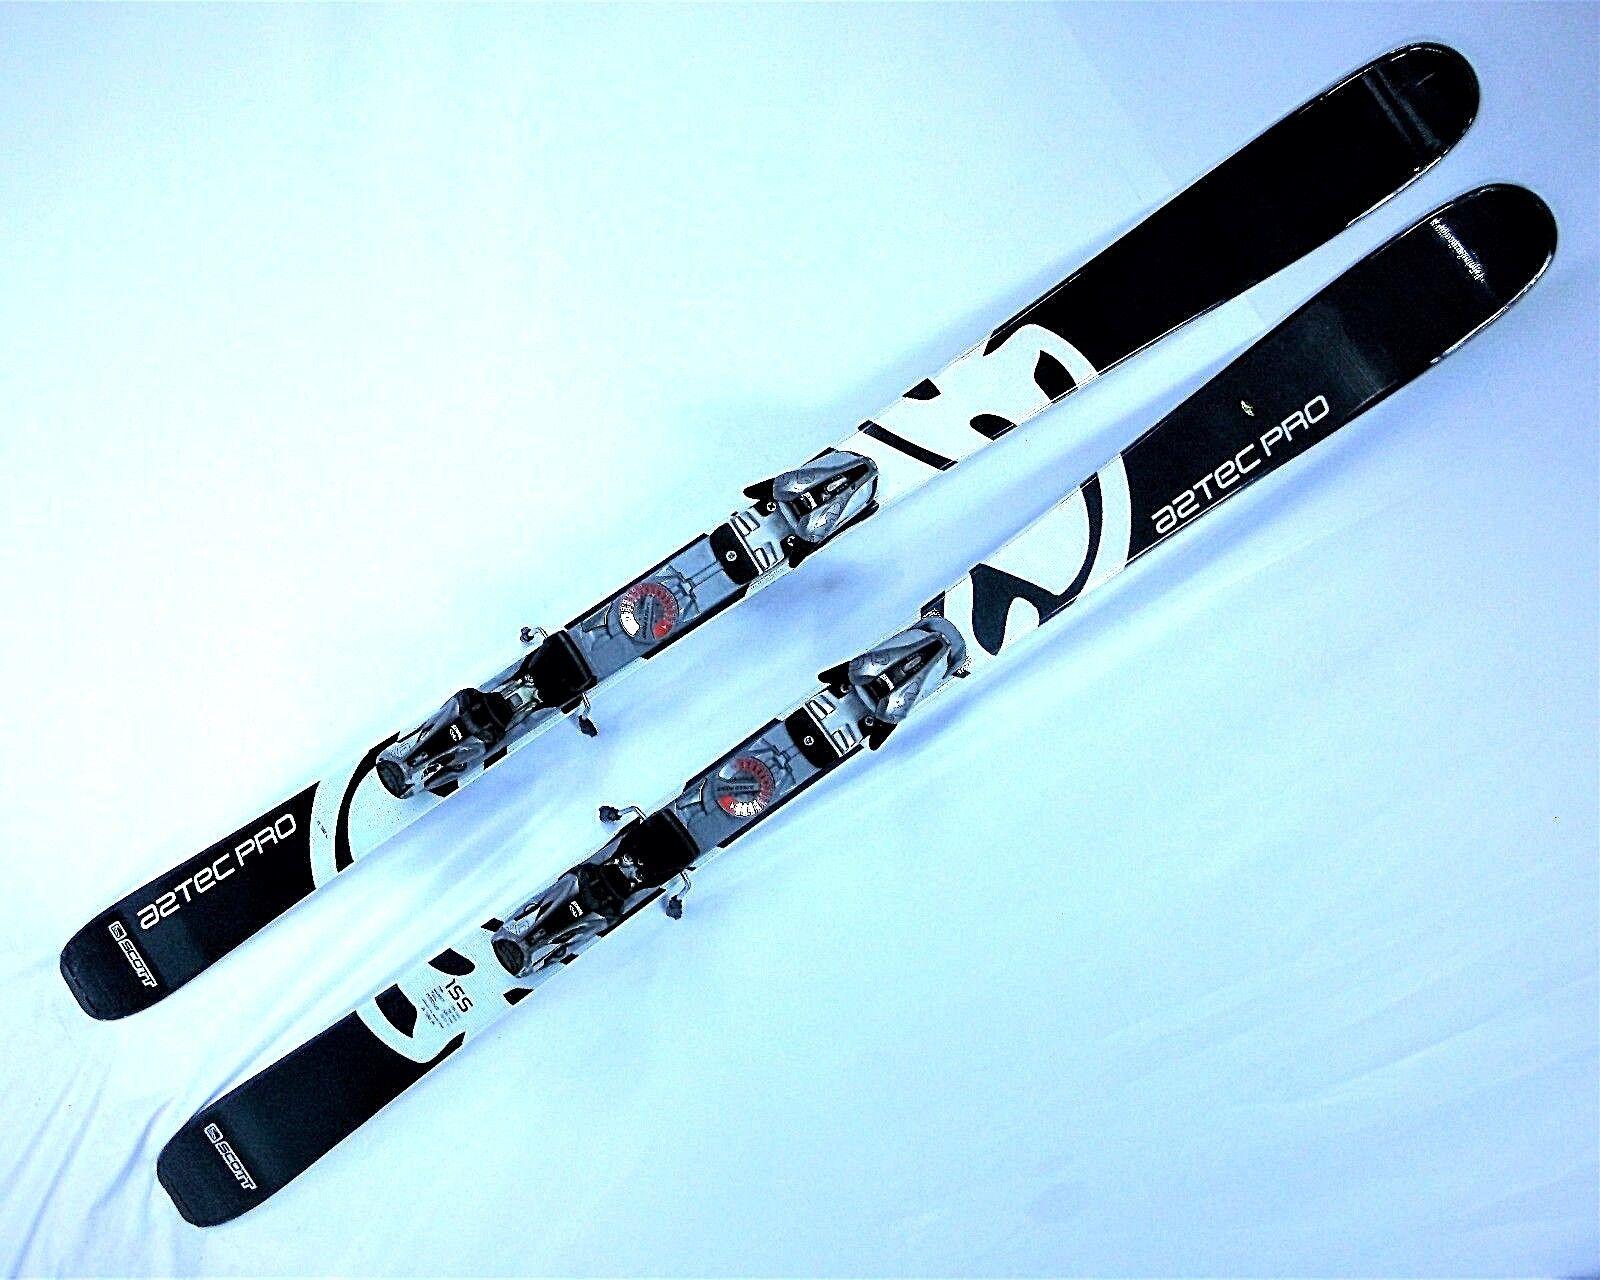 Scott, Aztec Pro 155cm Ski, w Used Marker Speedpoint Binding or similar FITTED